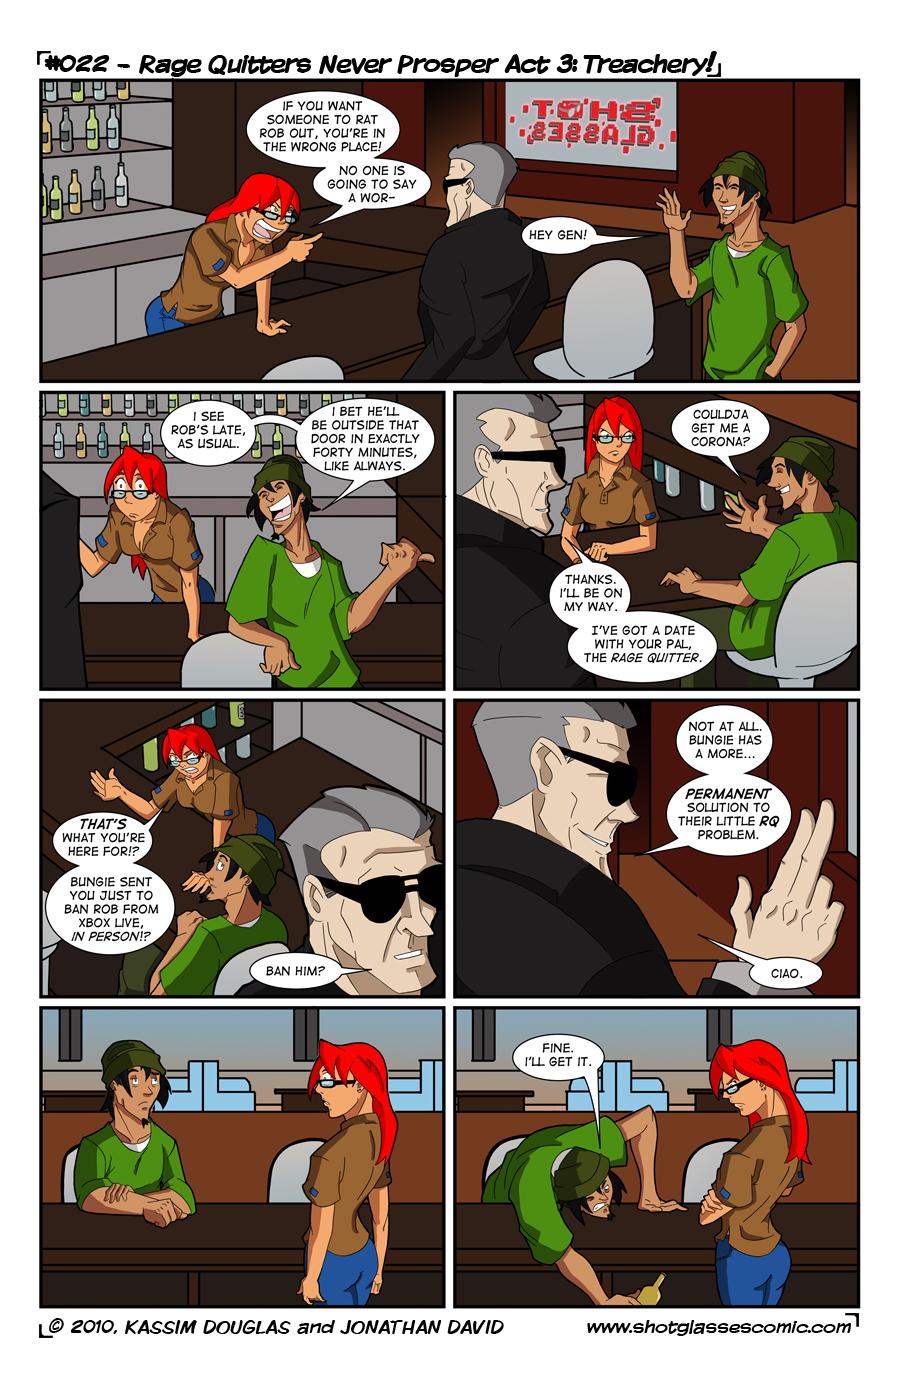 Rage Quitters Never Prosper Act 3: Treachery